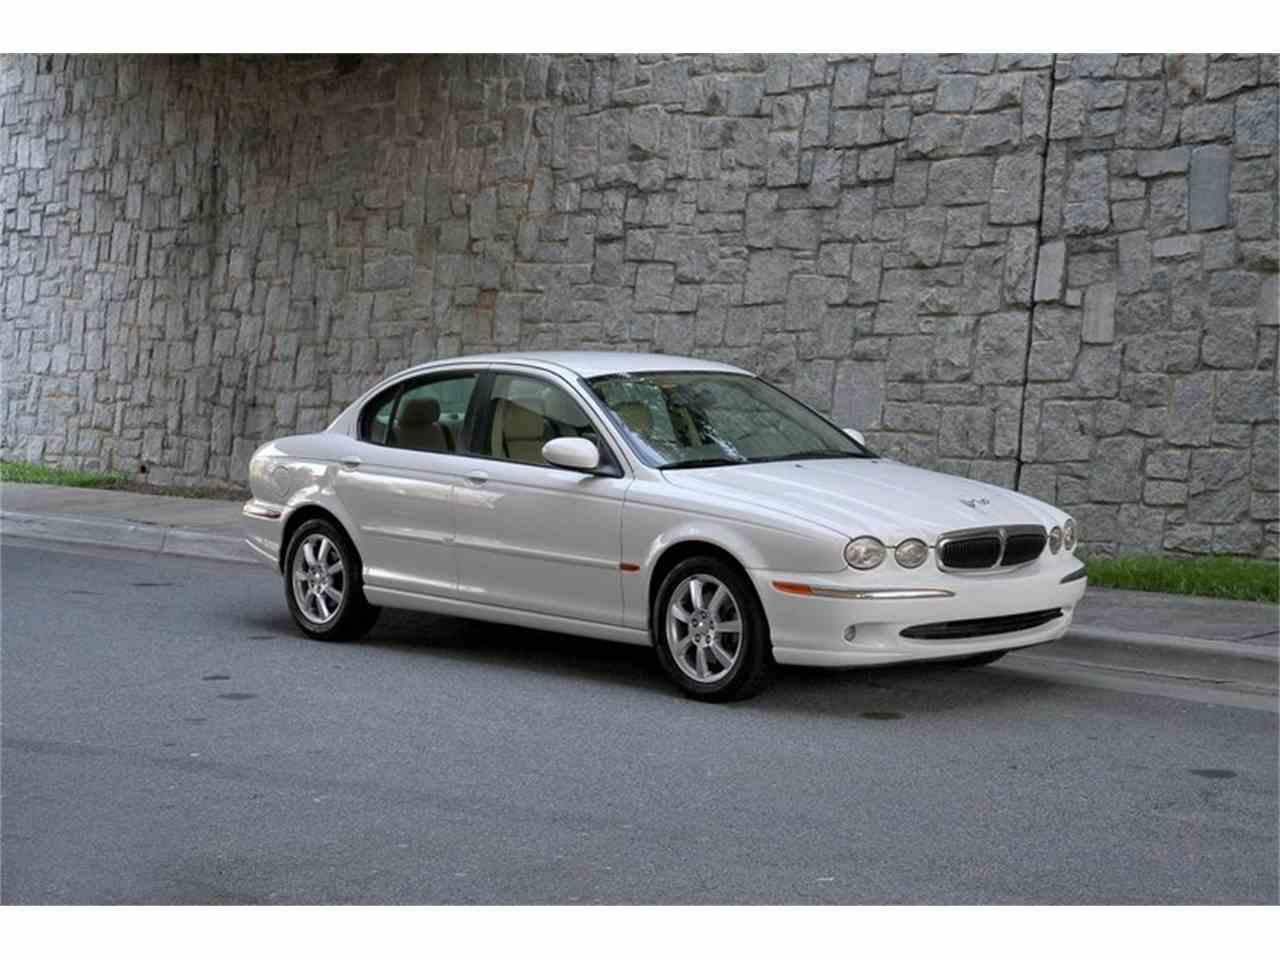 auctions on in left x auto for austin vehicle view jaguar silver carfinder type title en salvage copart lot tx online sale